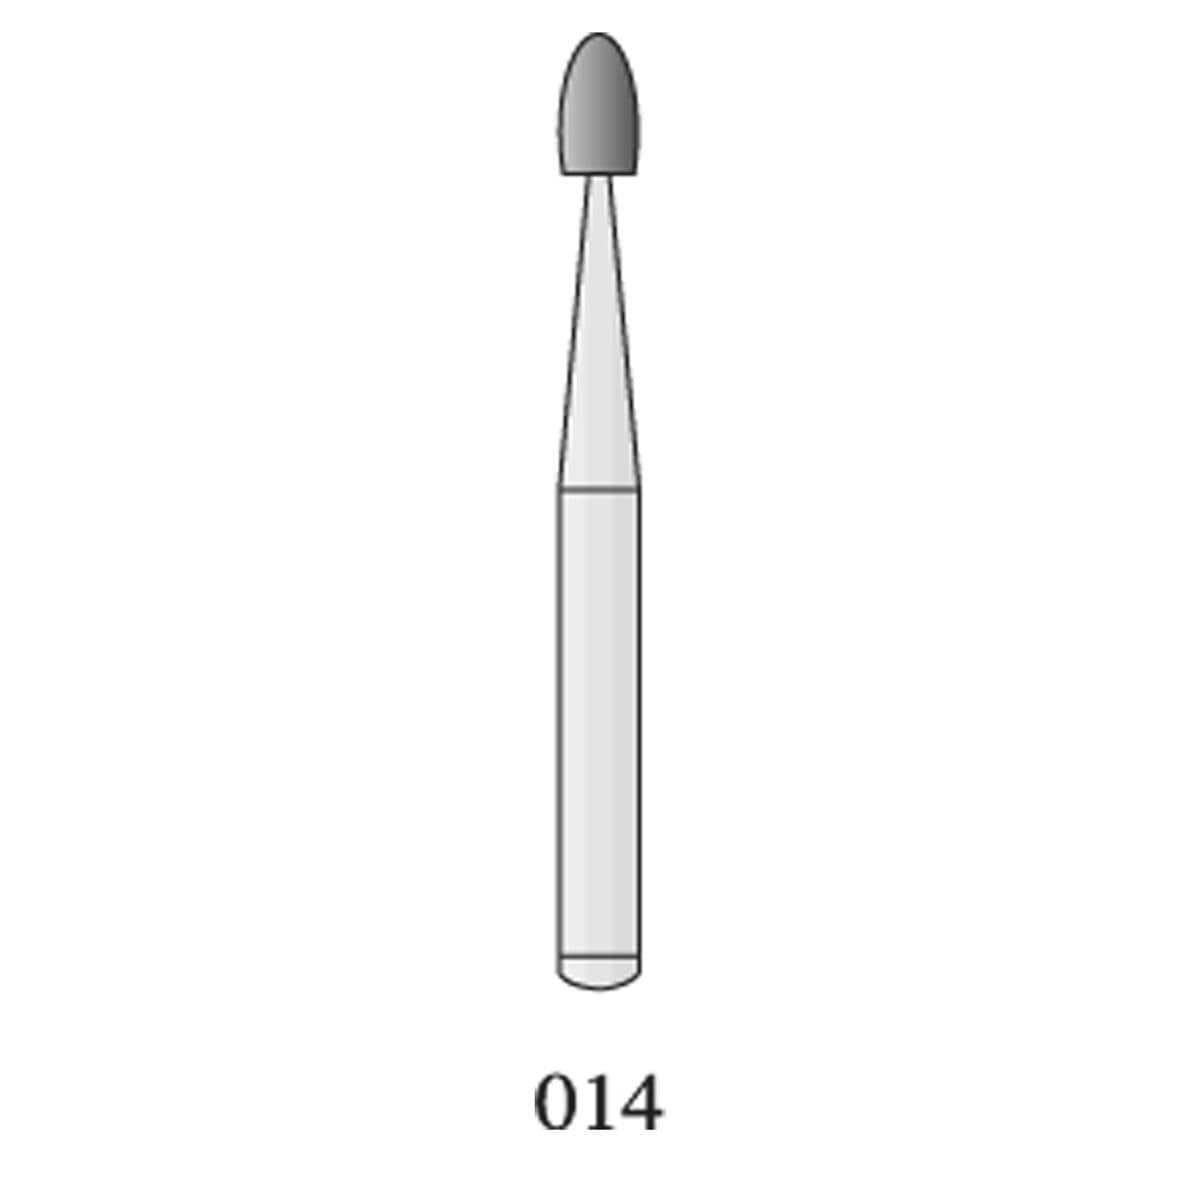 Fresa para desbarbar 6 mm de di/ámetro, metal duro, 90/° CNC QUALIT/ÄT VHM